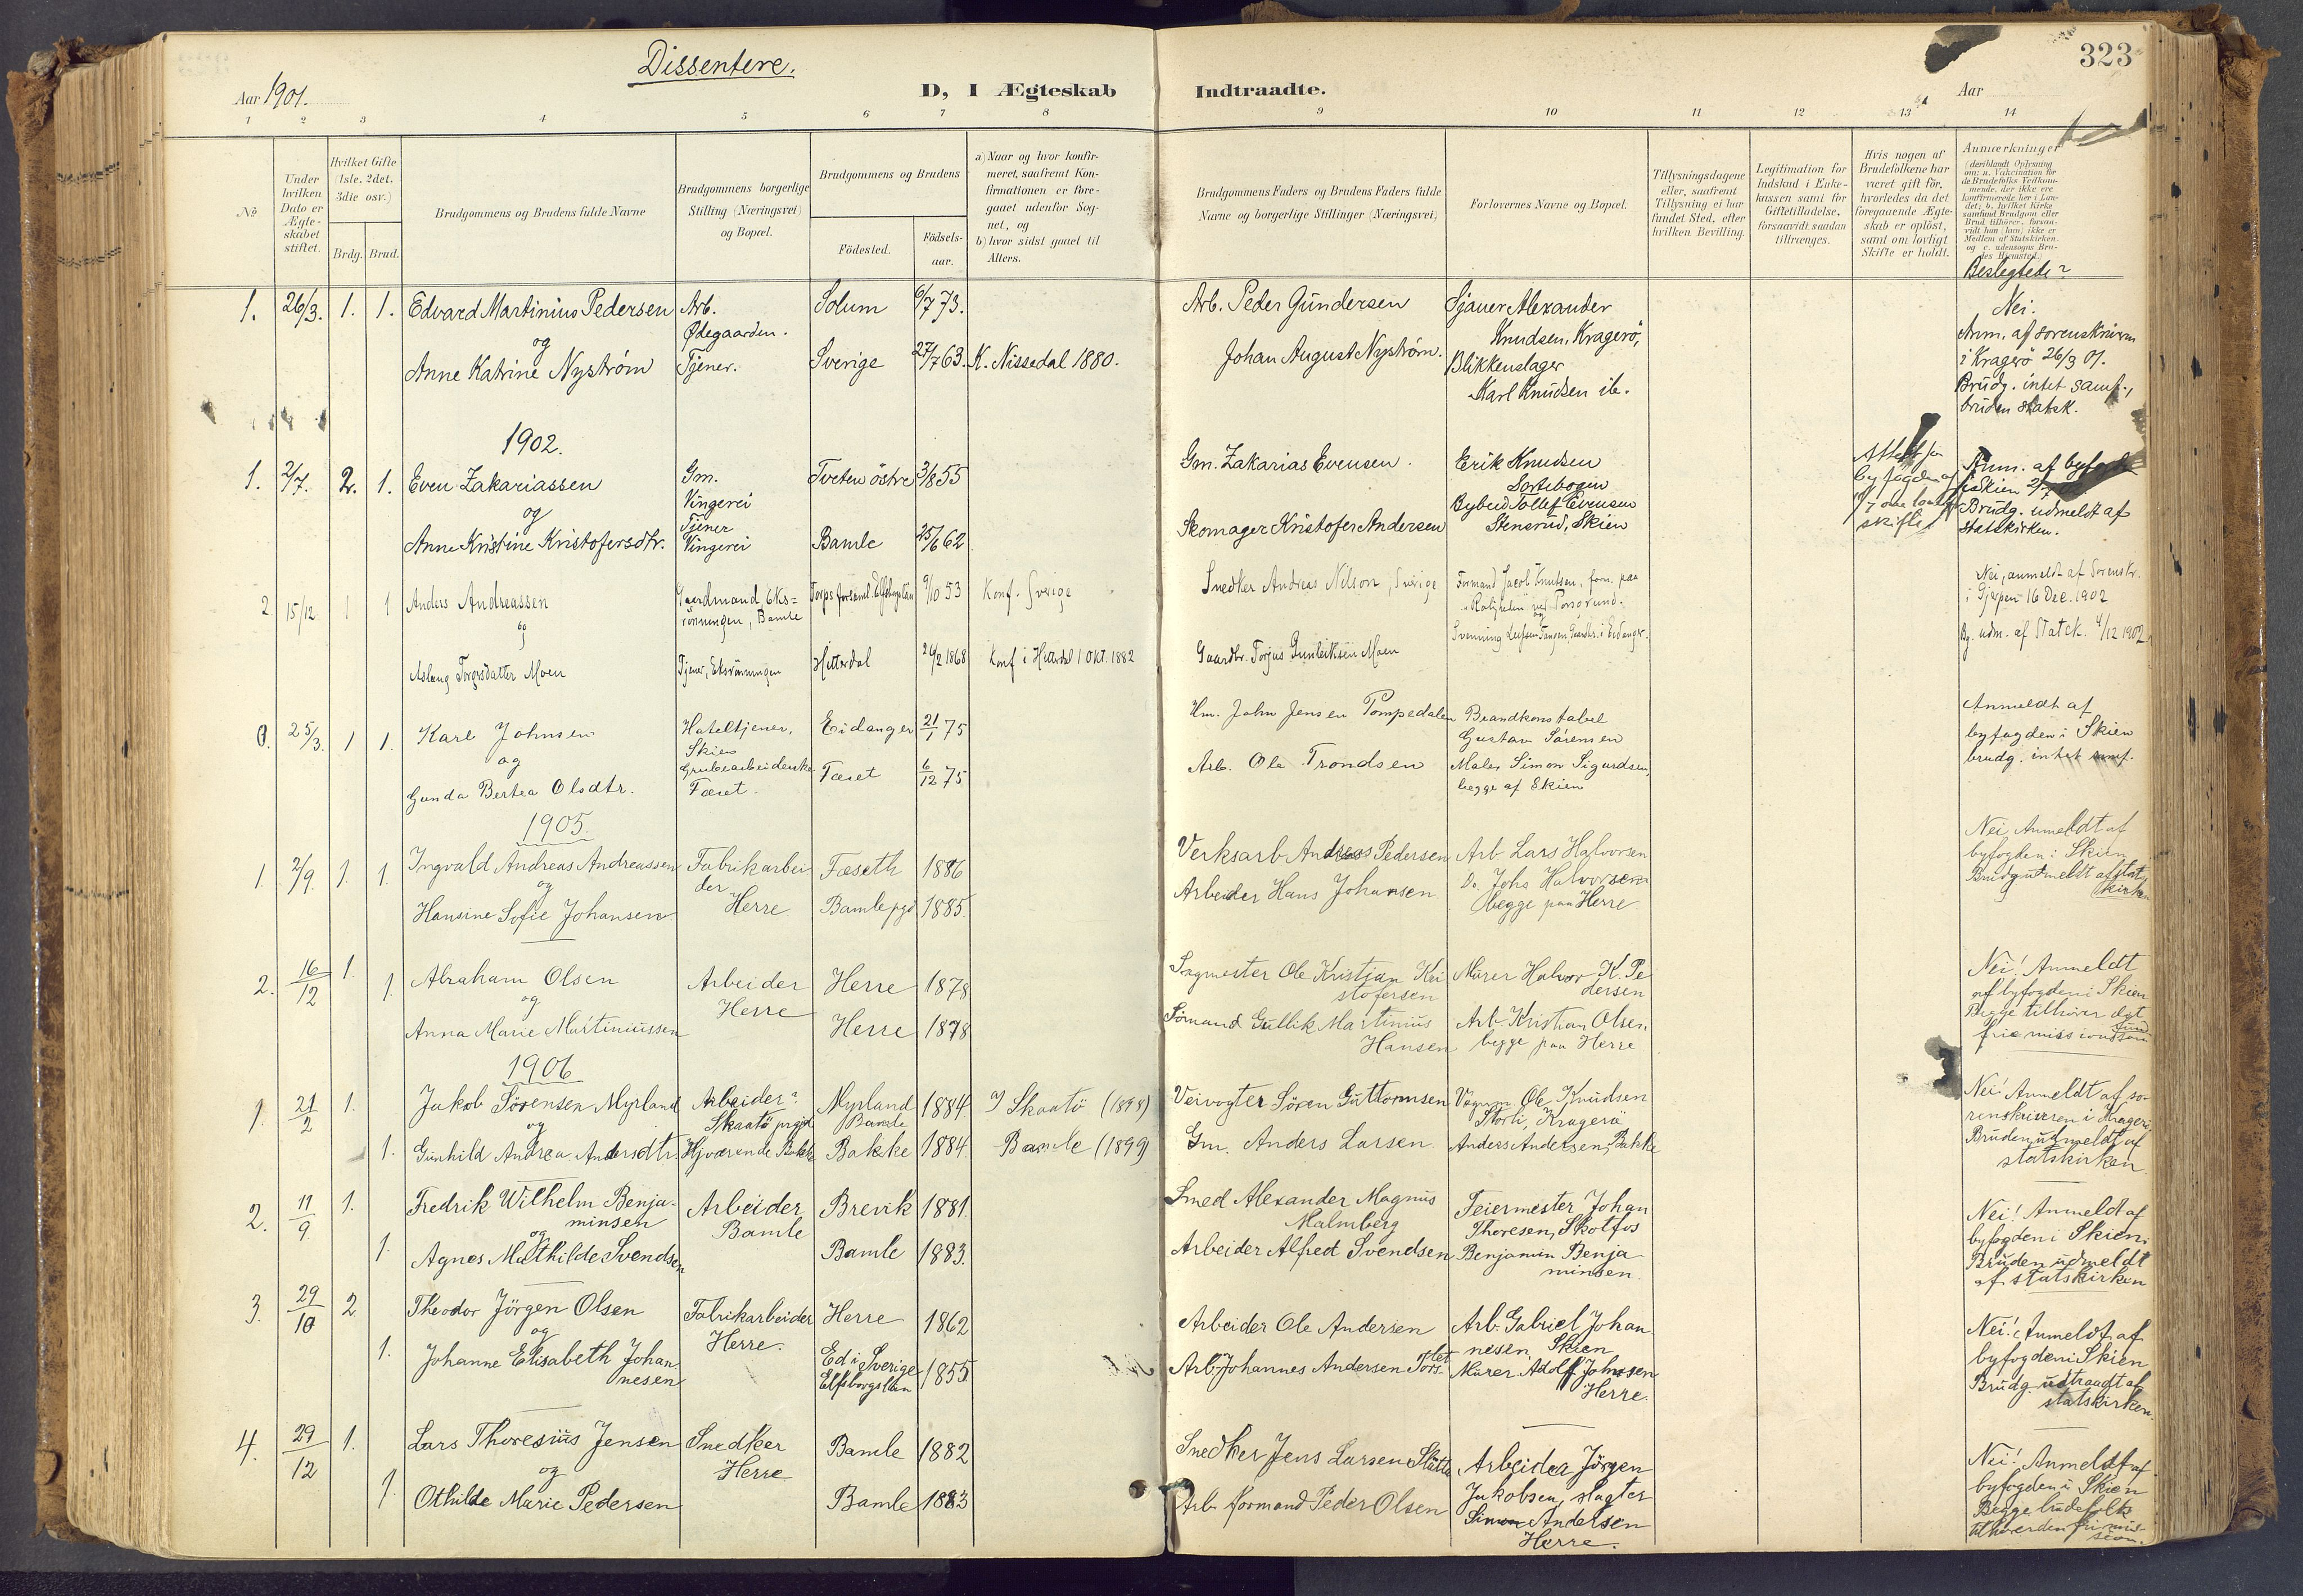 SAKO, Bamble kirkebøker, F/Fa/L0009: Ministerialbok nr. I 9, 1901-1917, s. 323